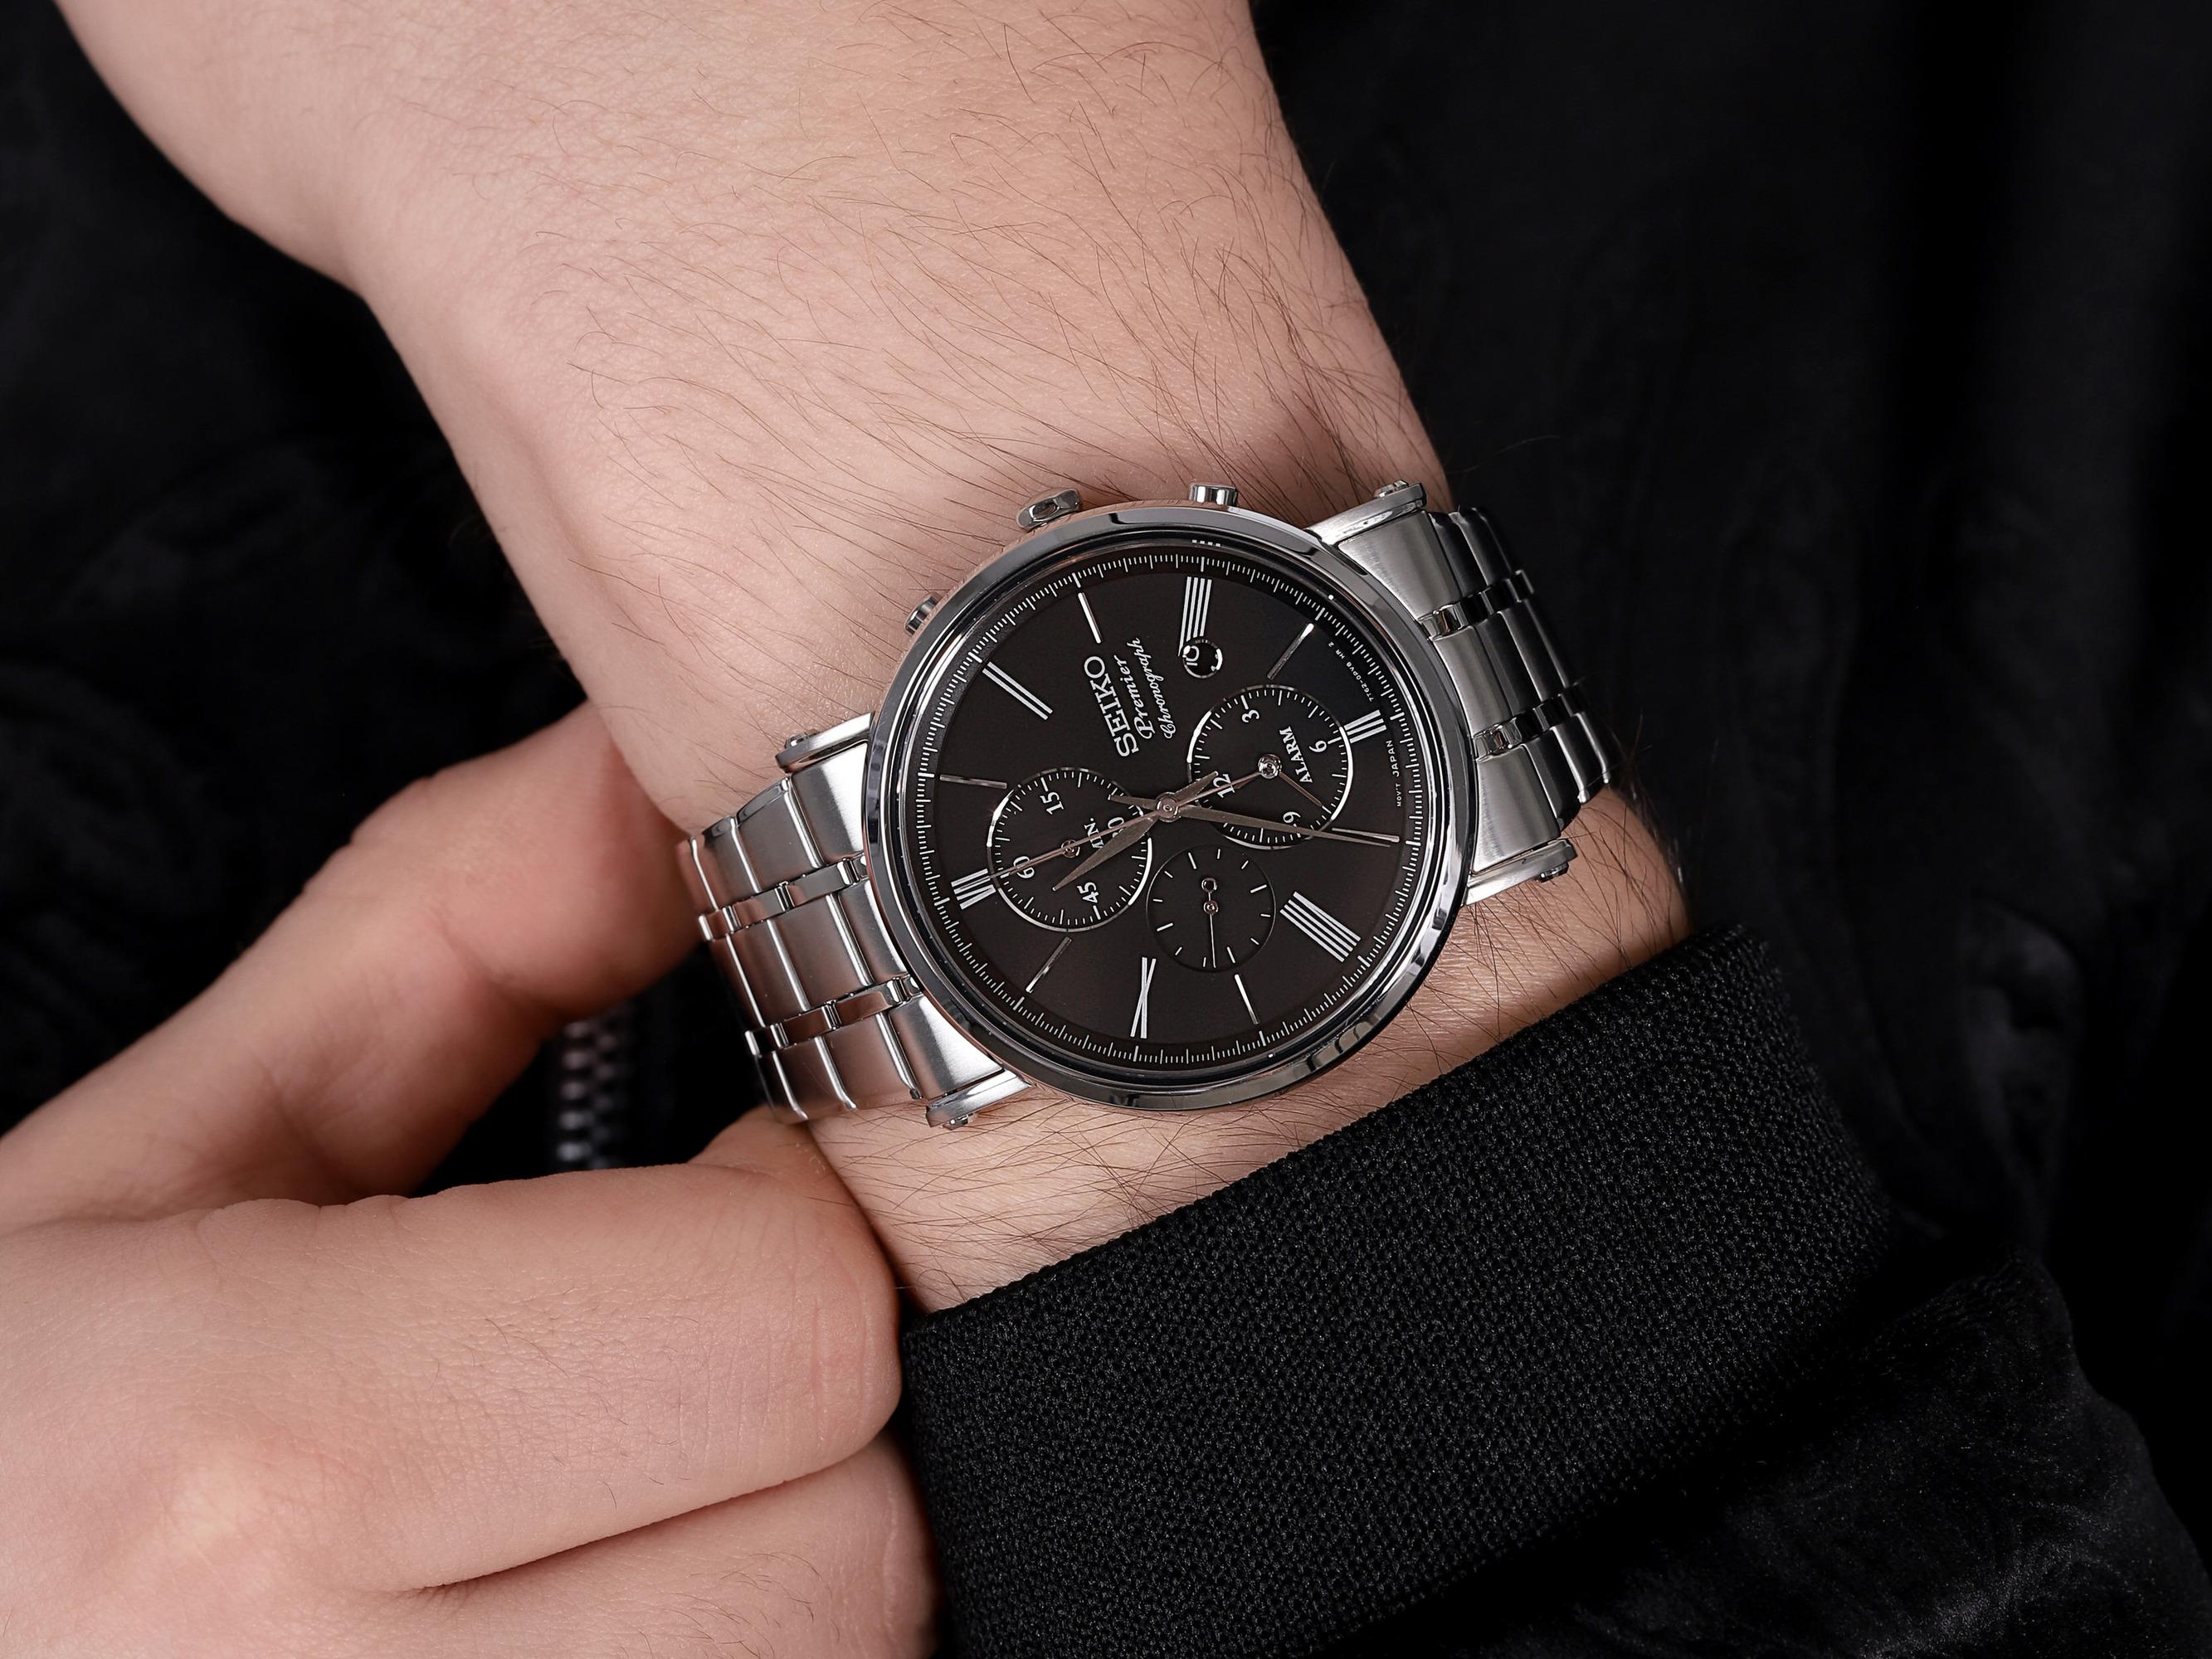 zegarek Seiko SNAF75P1 Premier Chronograph męski z chronograf Chronograph